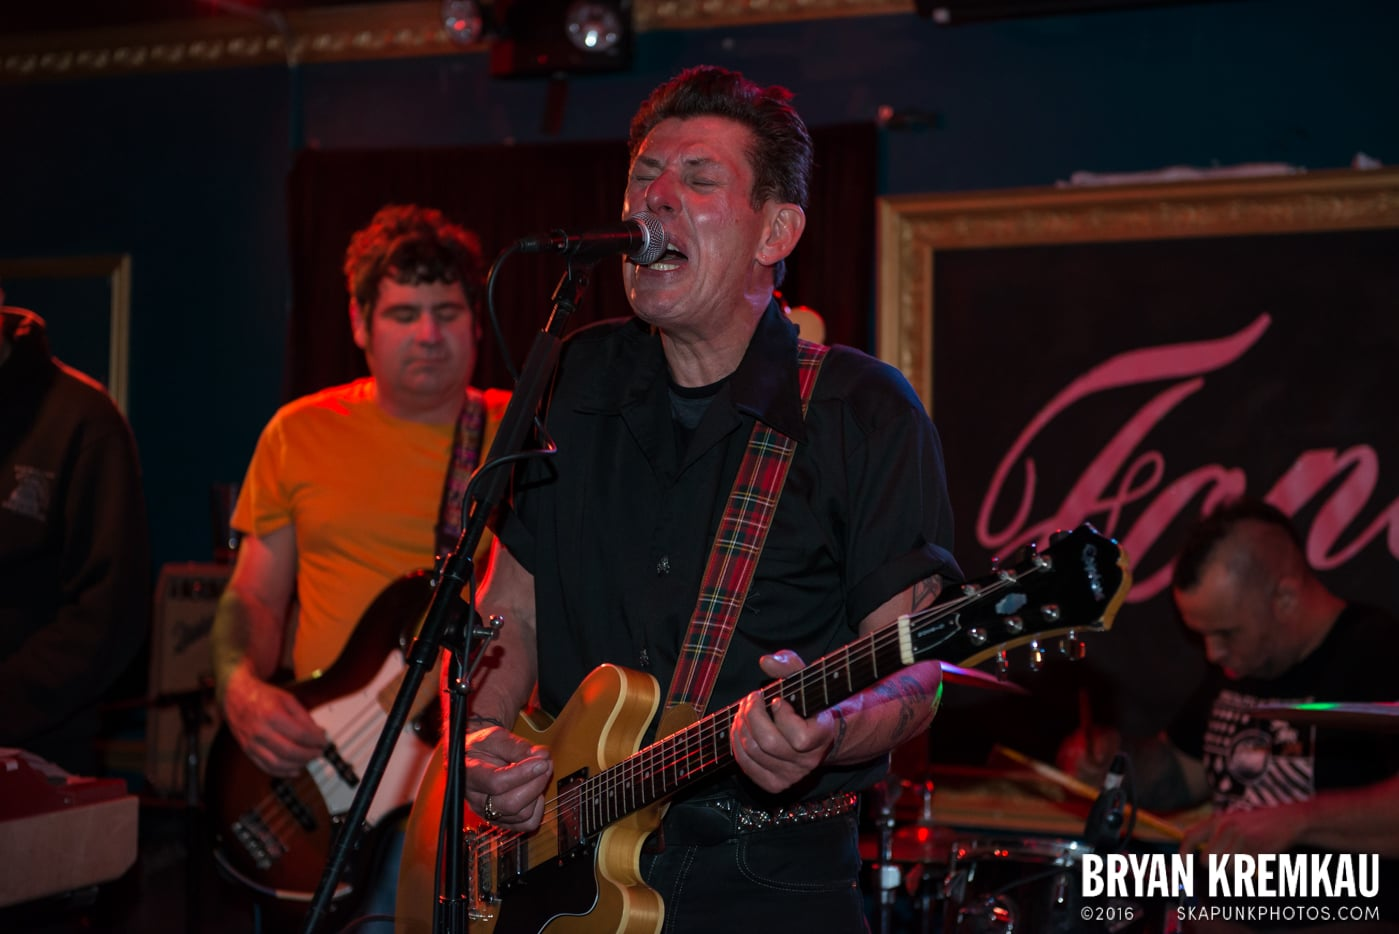 Roddy Radiation & The Scotch Bonnets @ Fontana's, NYC - 4.25.15 (3)